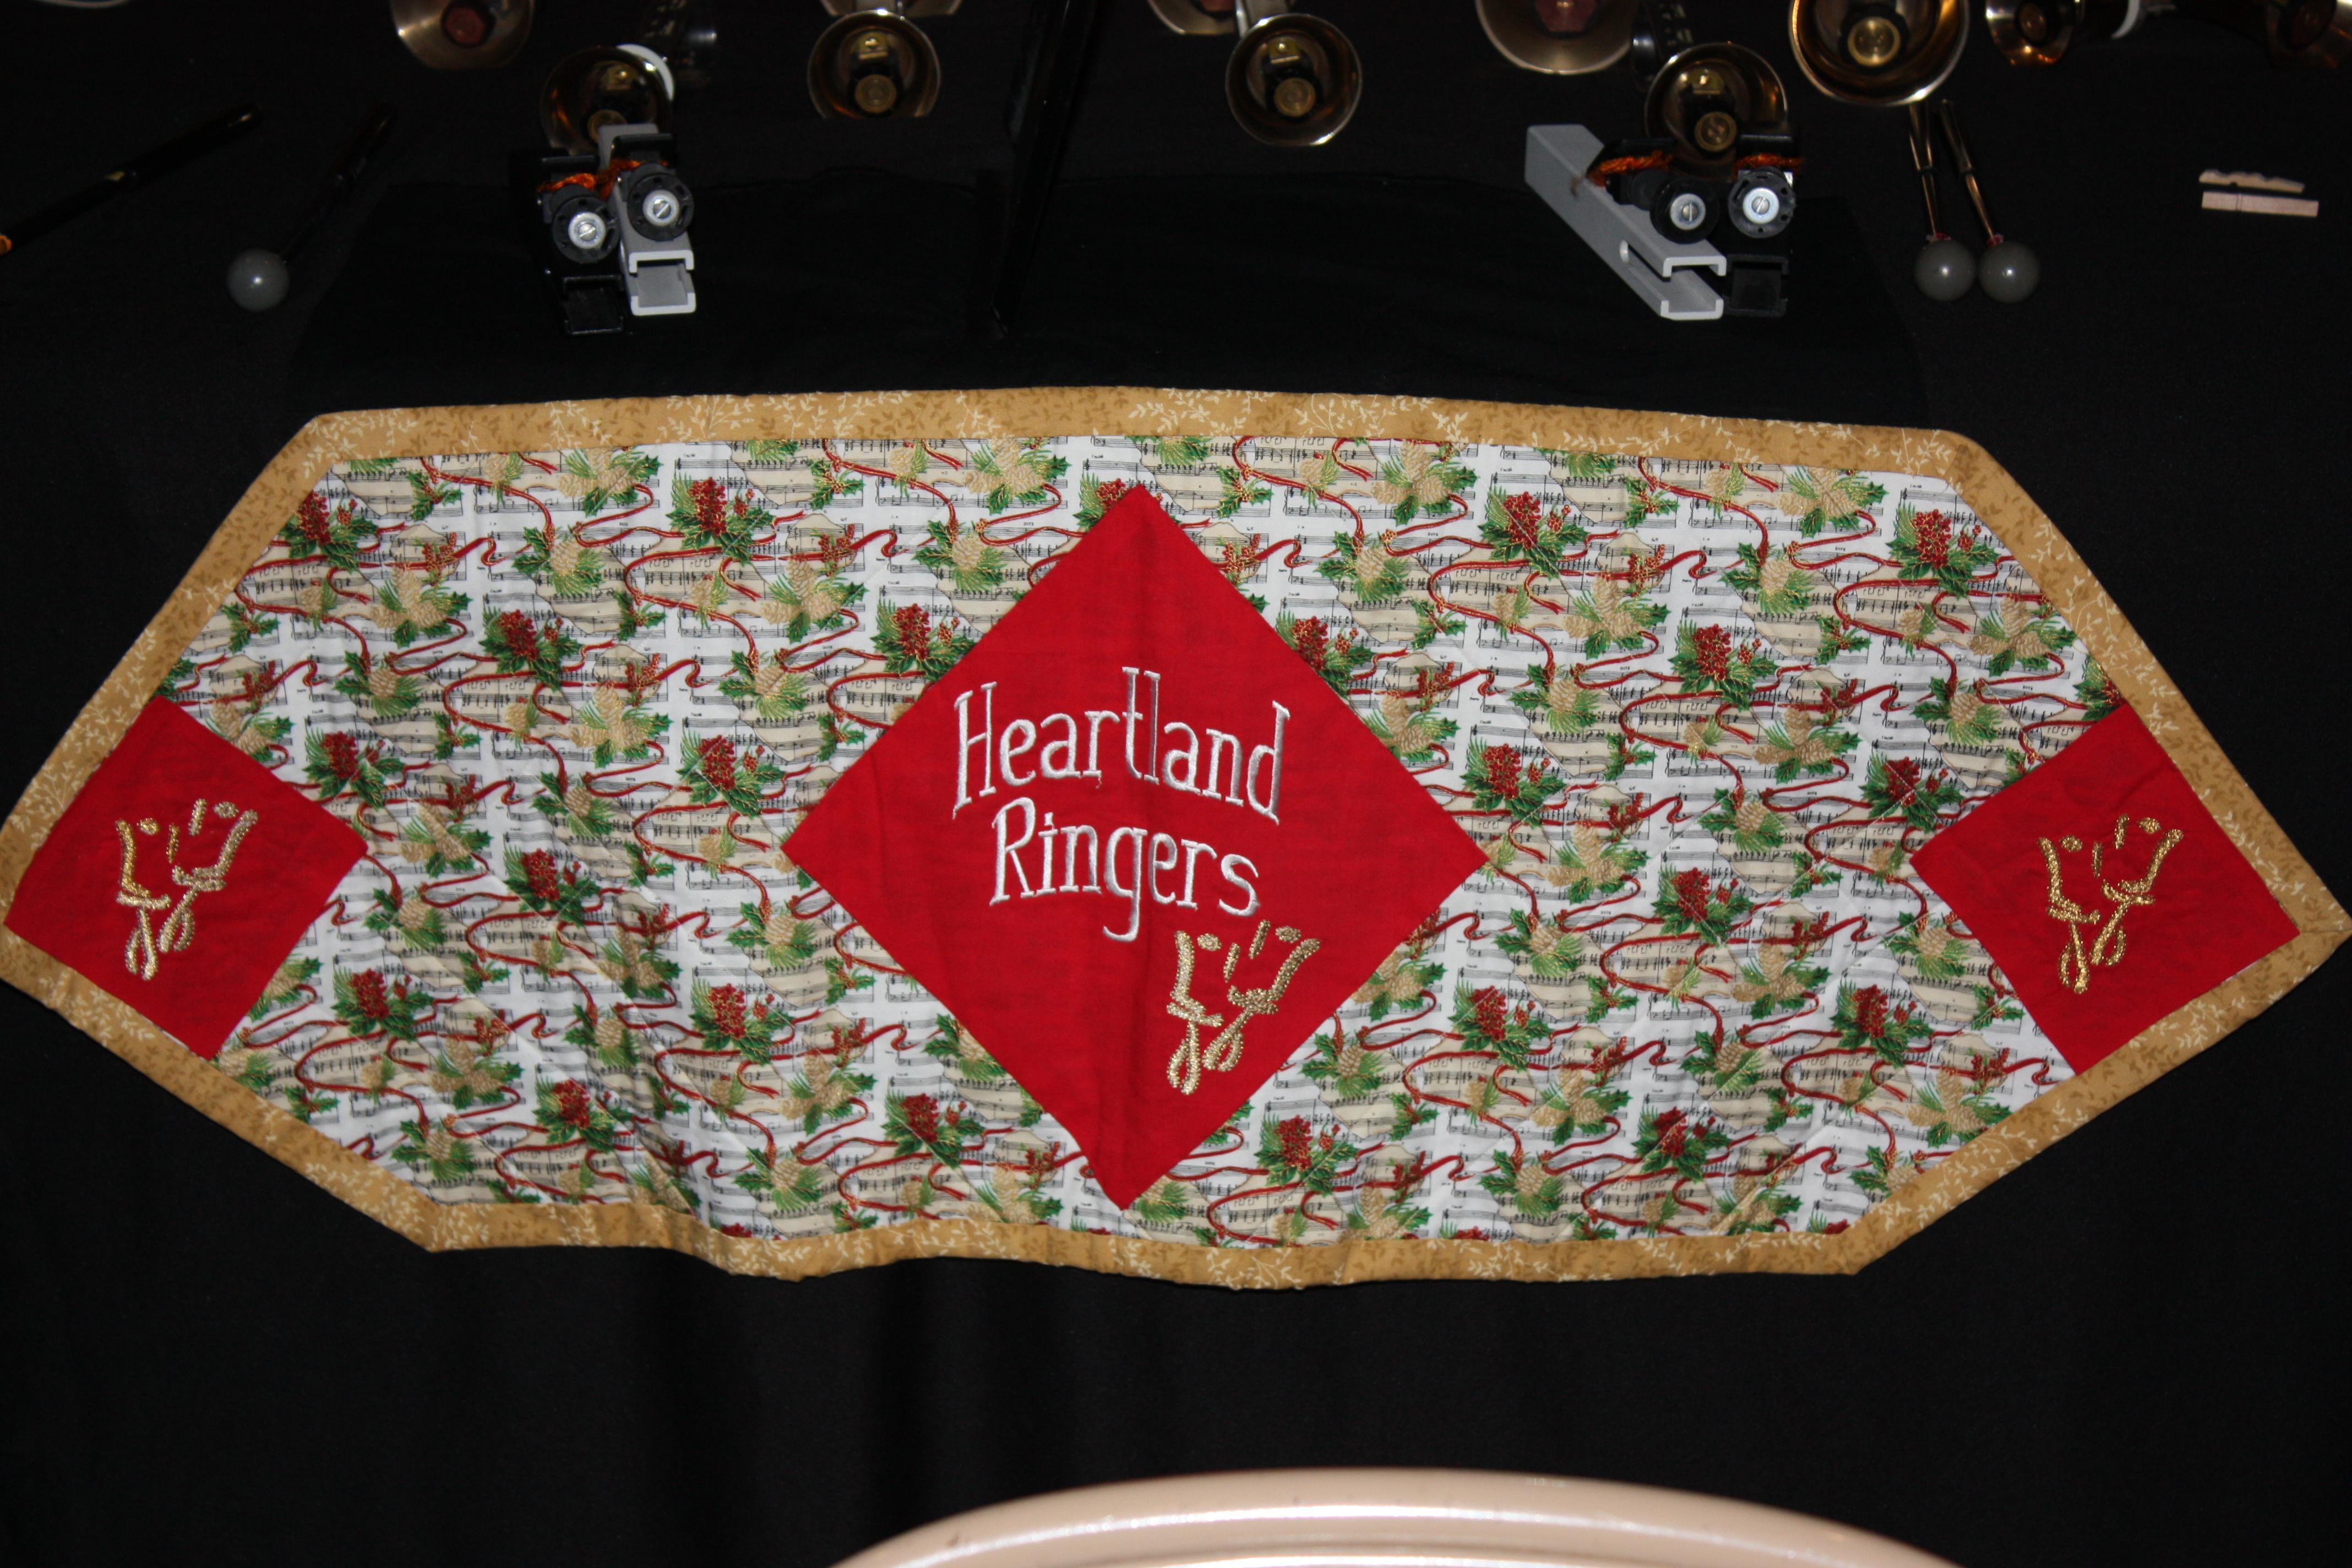 Heartland Ringers